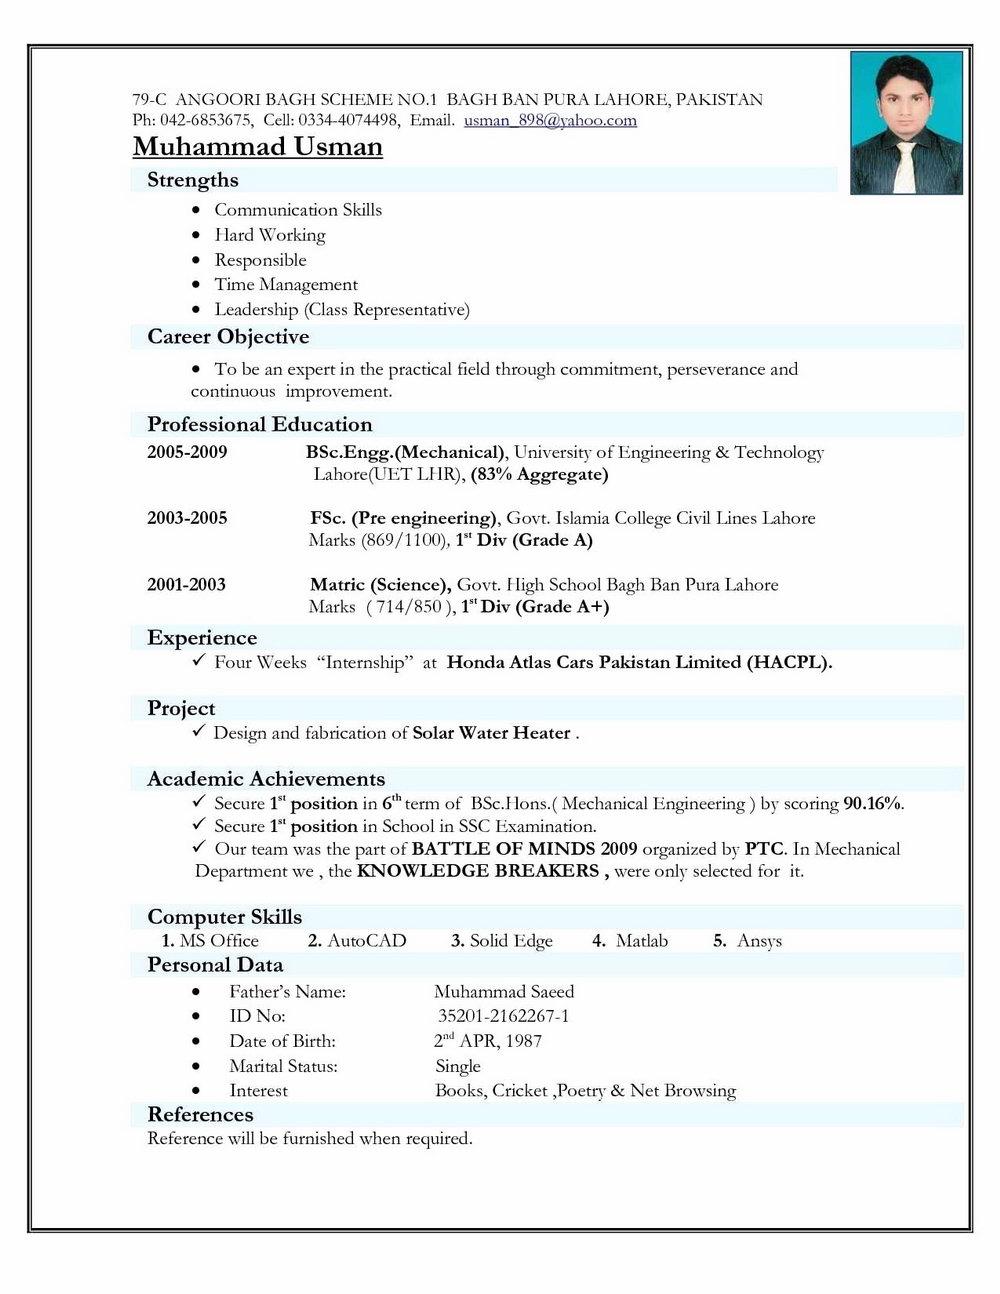 Microsoft Word Resume Templates 2011 Free